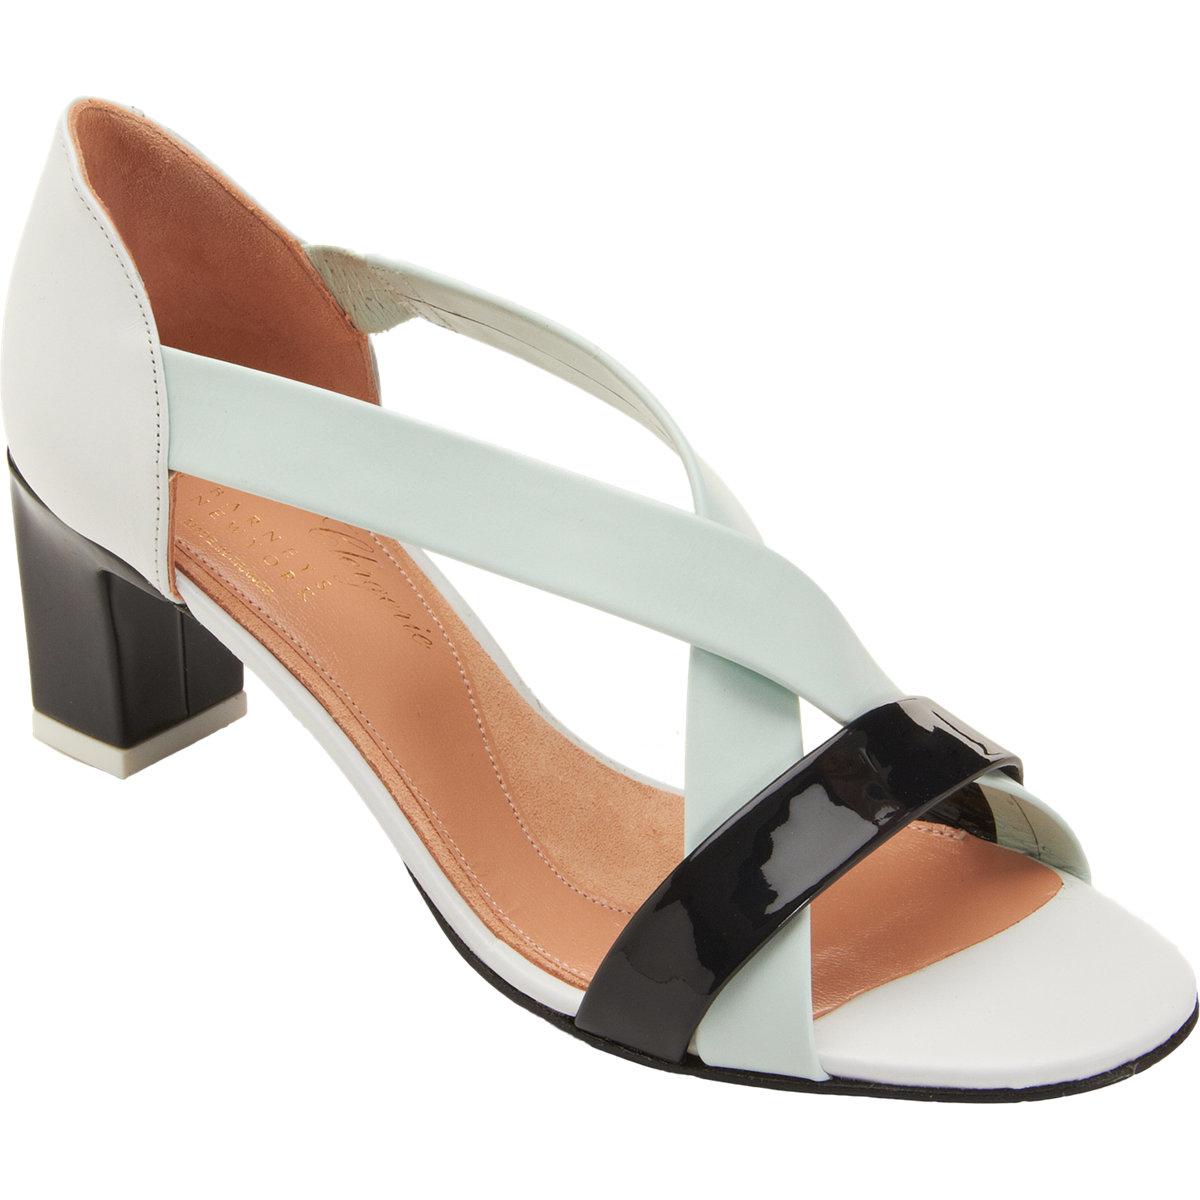 e0527ca9b41 Lyst - Robert Clergerie Criss Cross Strap Sandals in White